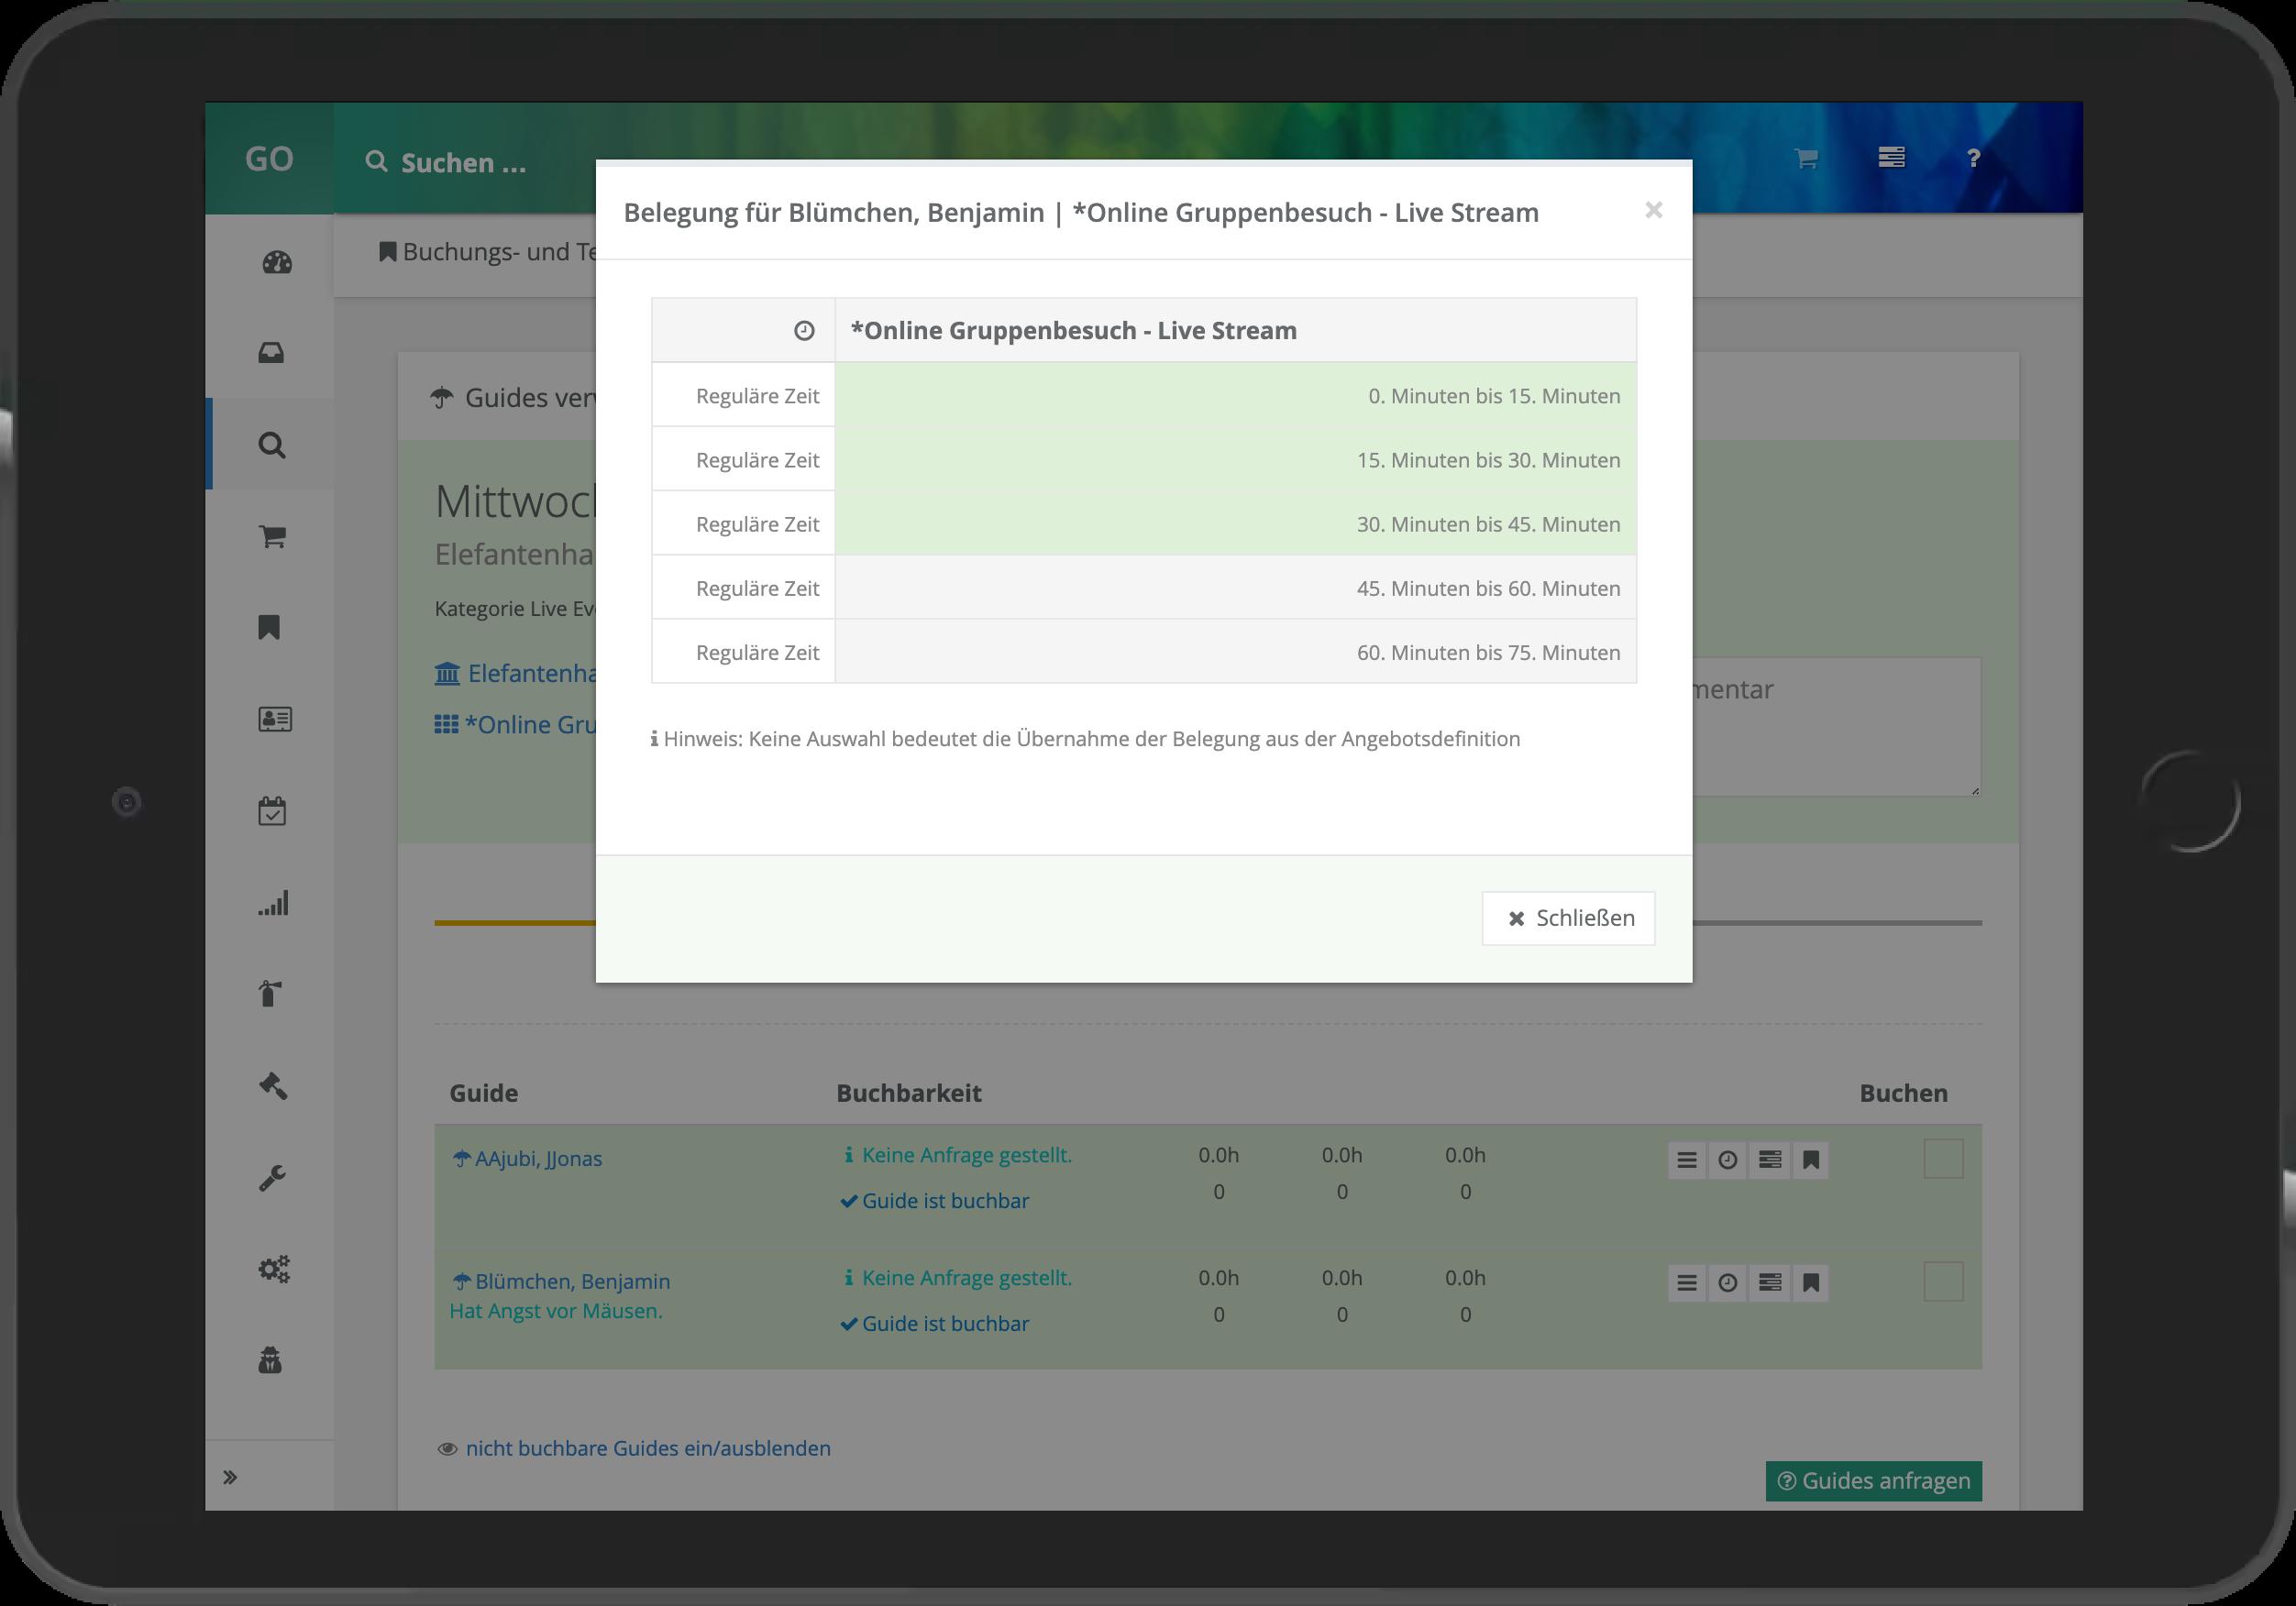 Screenshot der Festlegung der Guidebelegung einer Buchung in go~mus